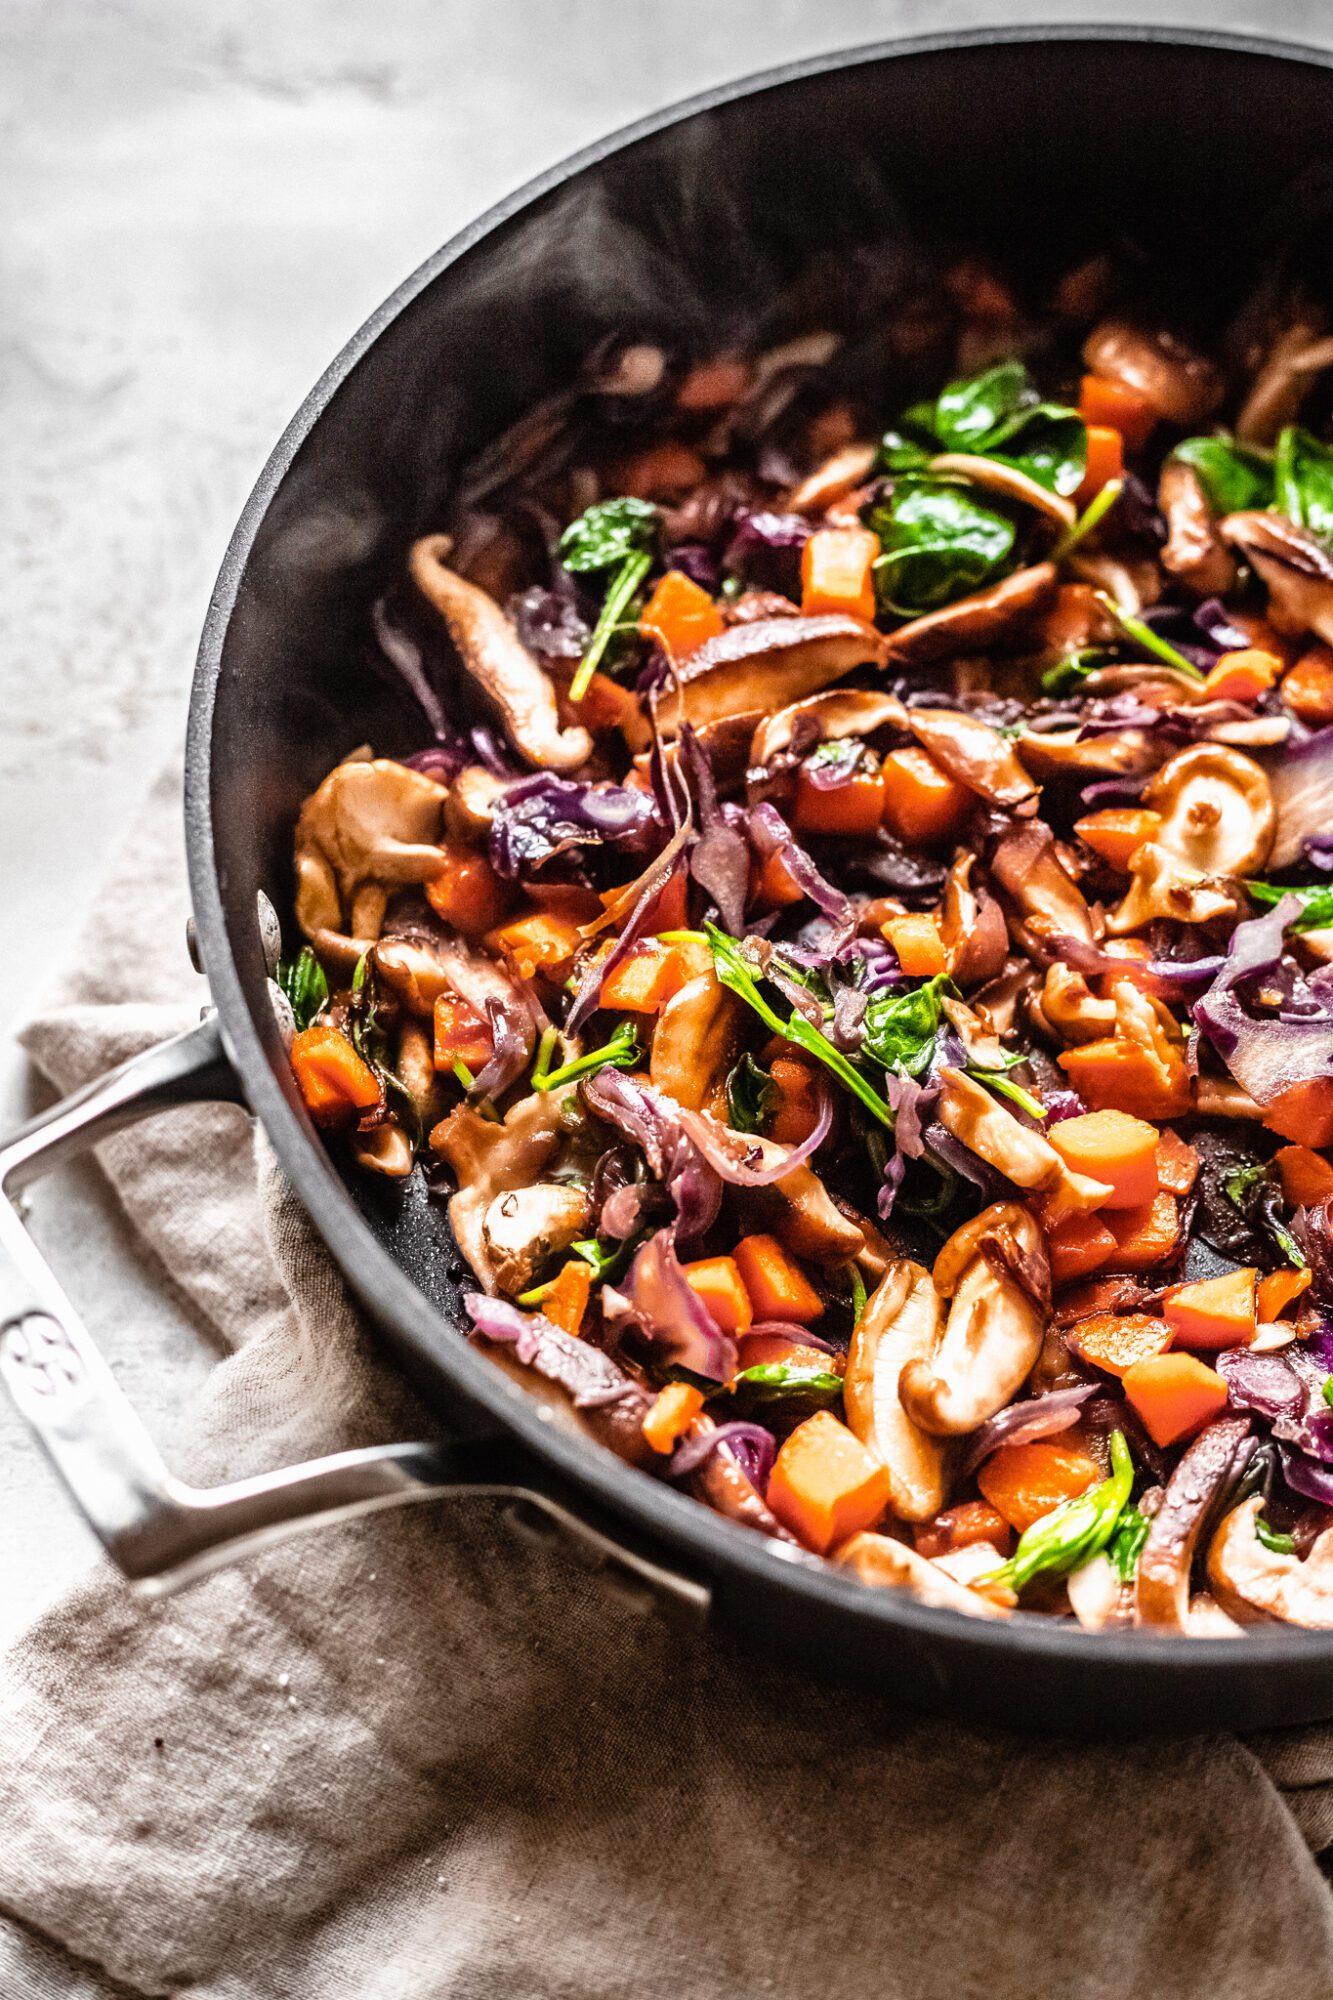 sauteed stir frey veggies in skillet